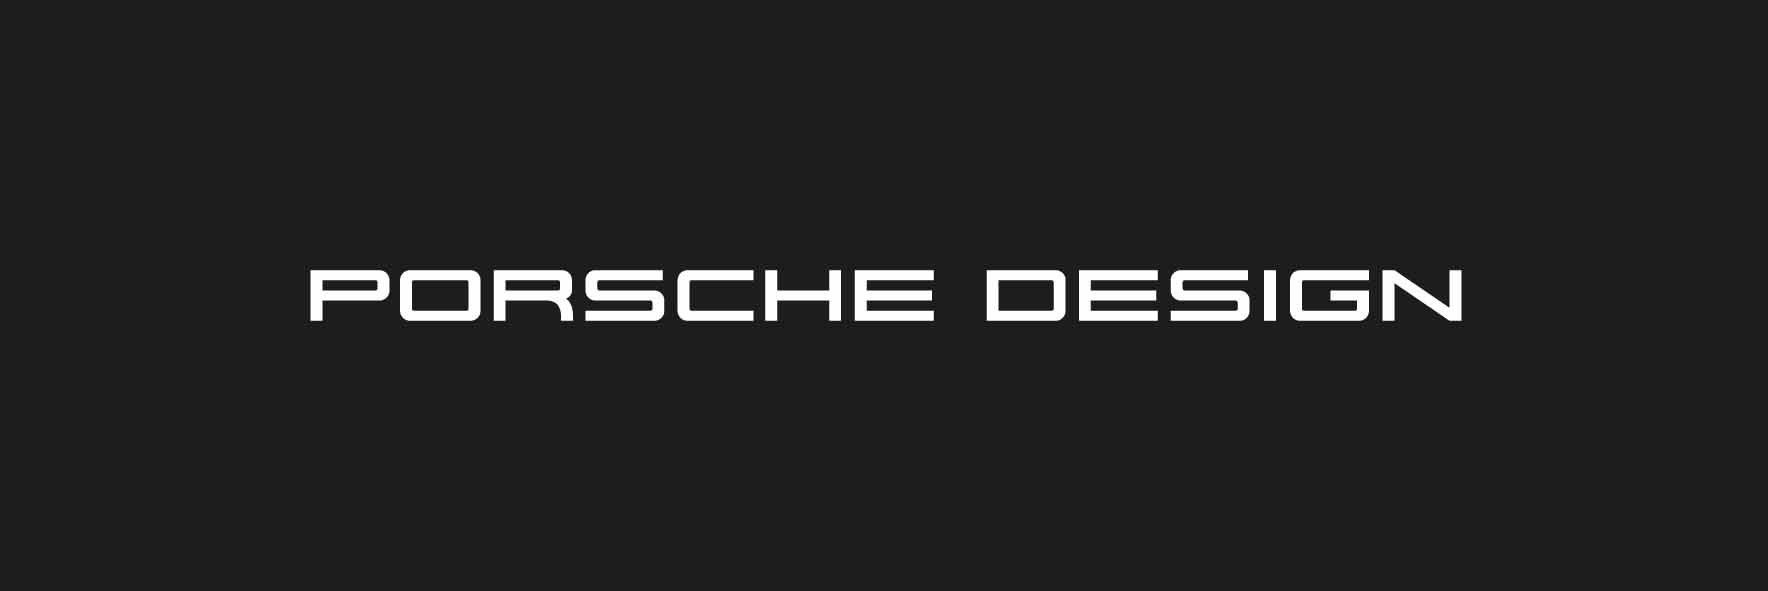 Porsche Design ist Sponsor der Classic Days Berlin